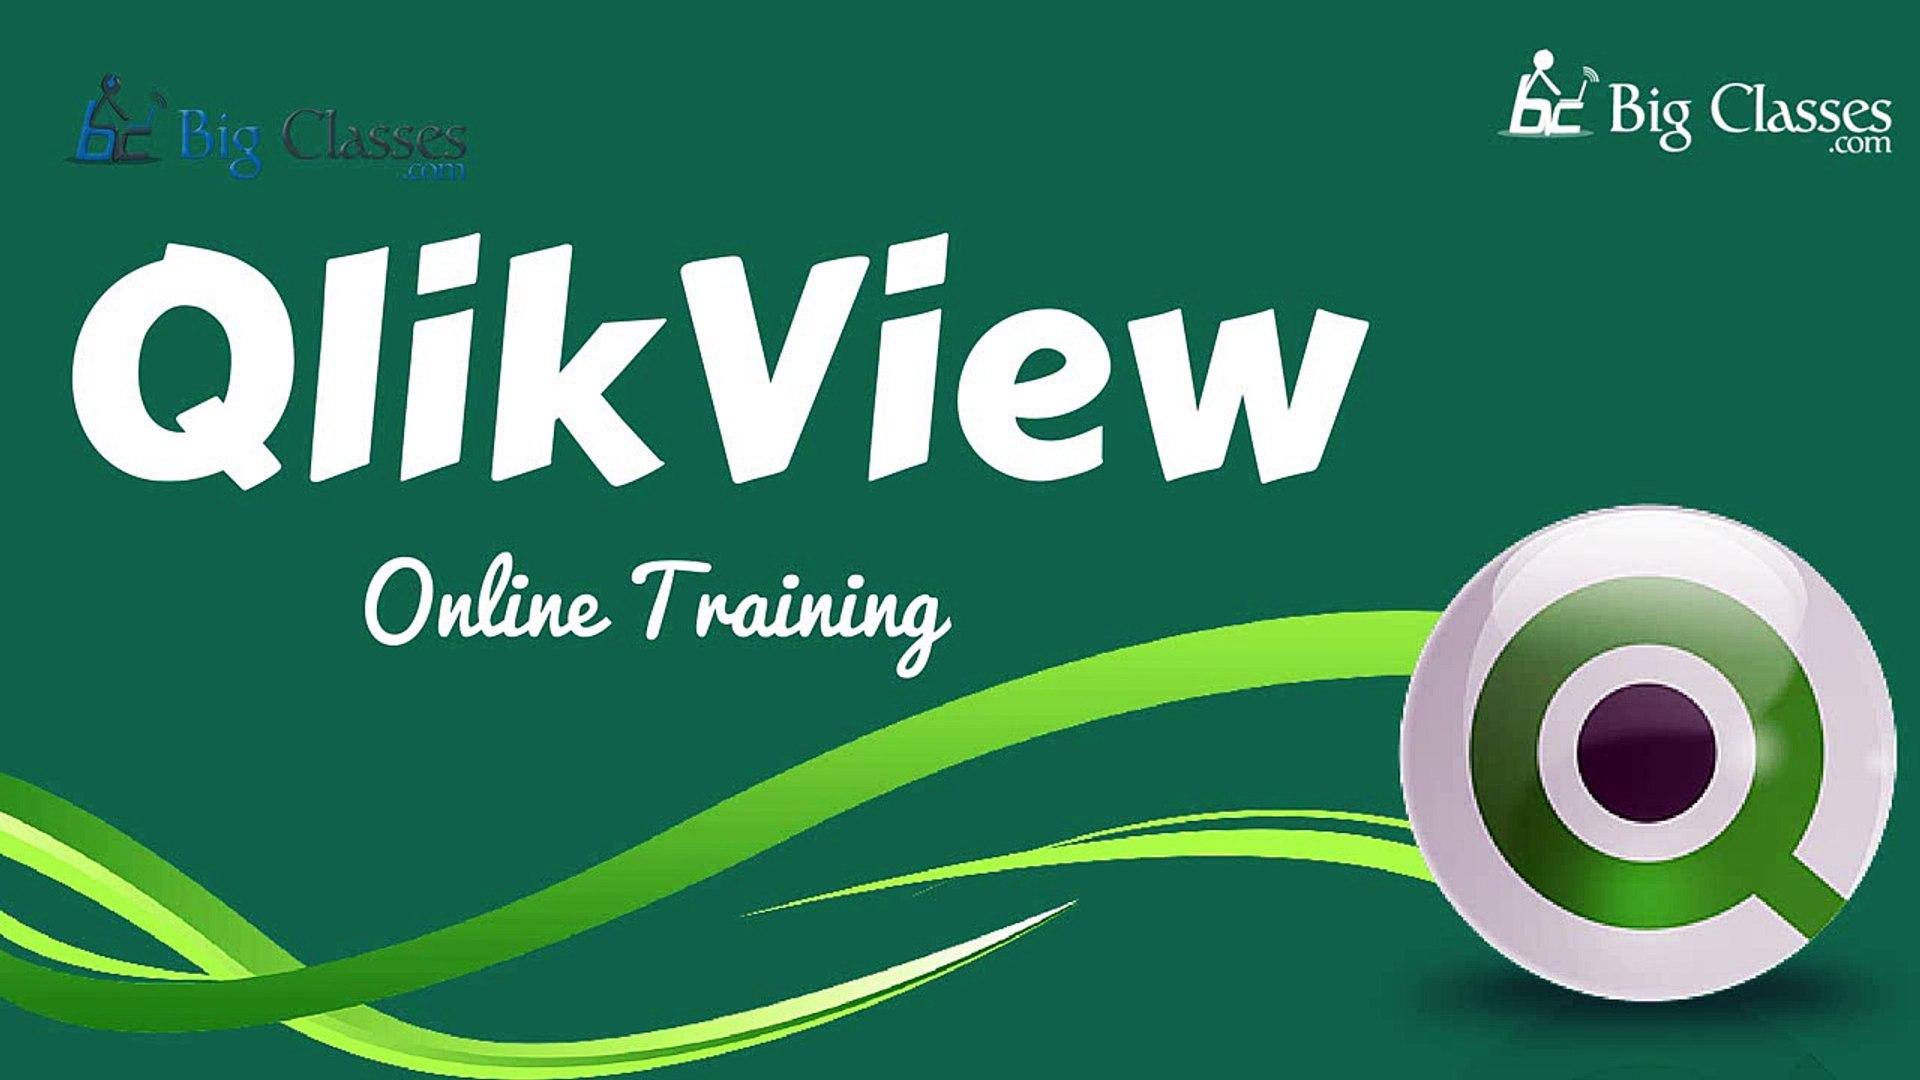 Qlikview Online Training | Qlikview Training Videos